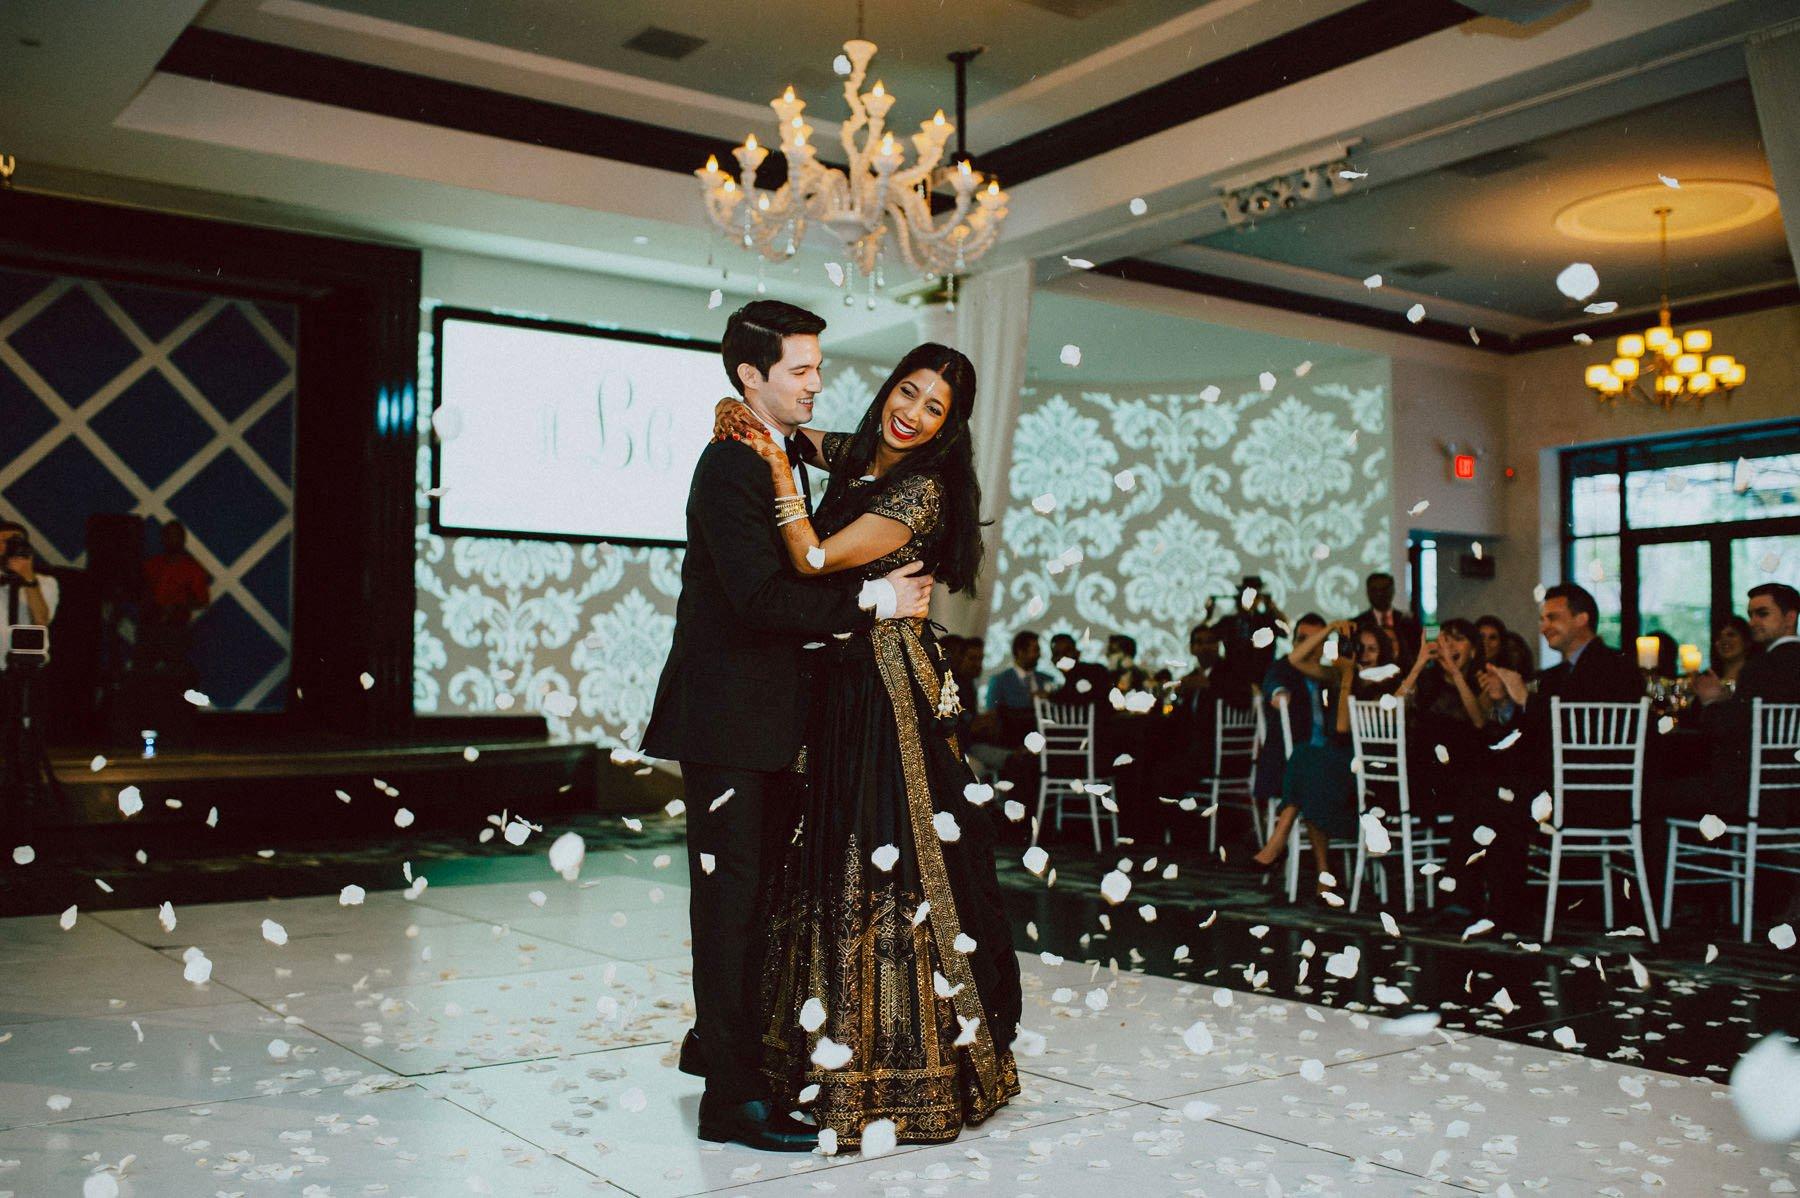 vie-philadelphia-indian-wedding-105.jpg